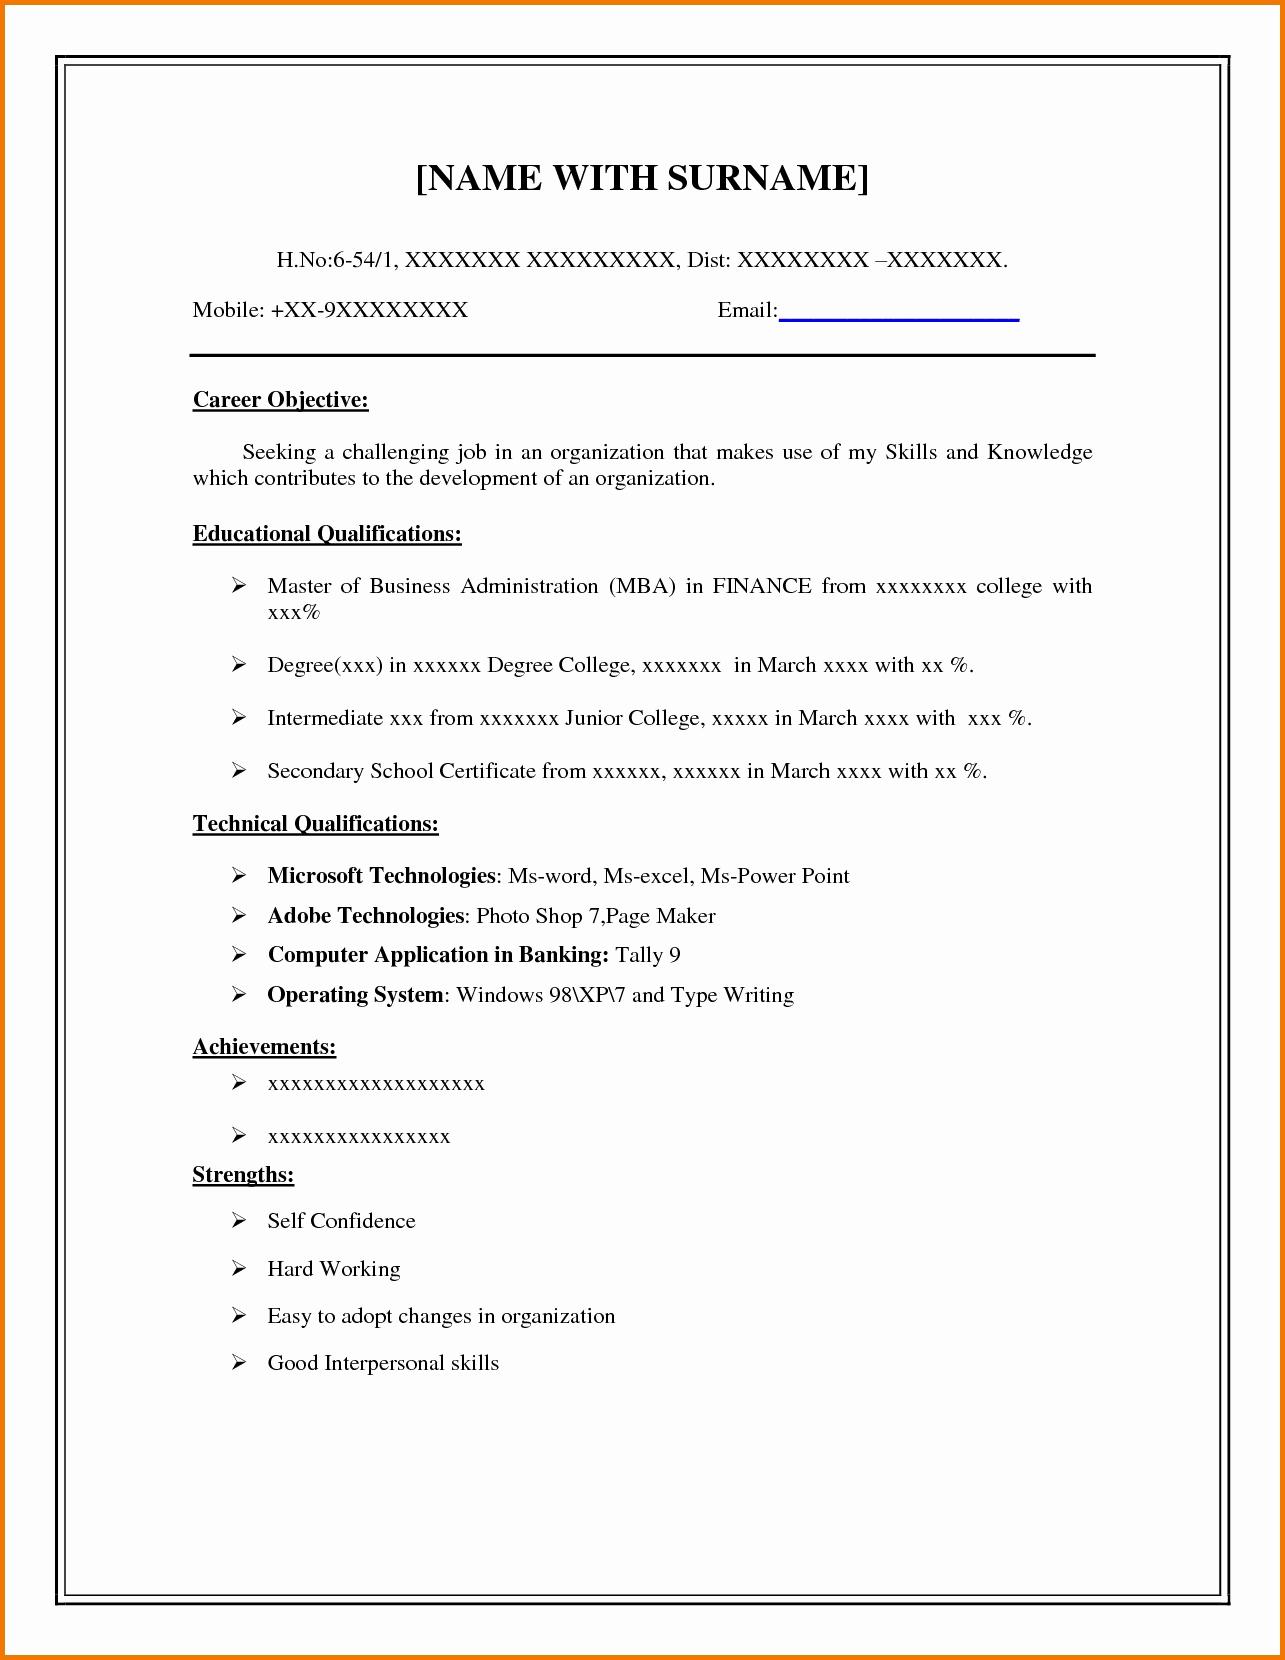 Resume Builder Free Line Printable